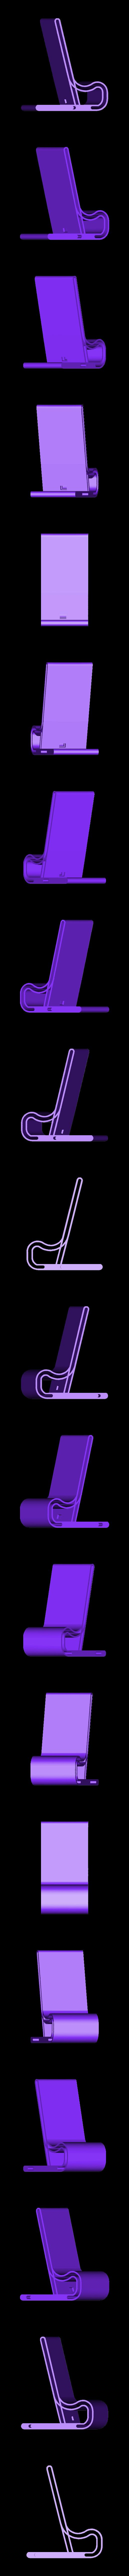 Modular_phone_holder_.stl Download free STL file Modular Phone Stand • 3D print model, FowlvidBastien